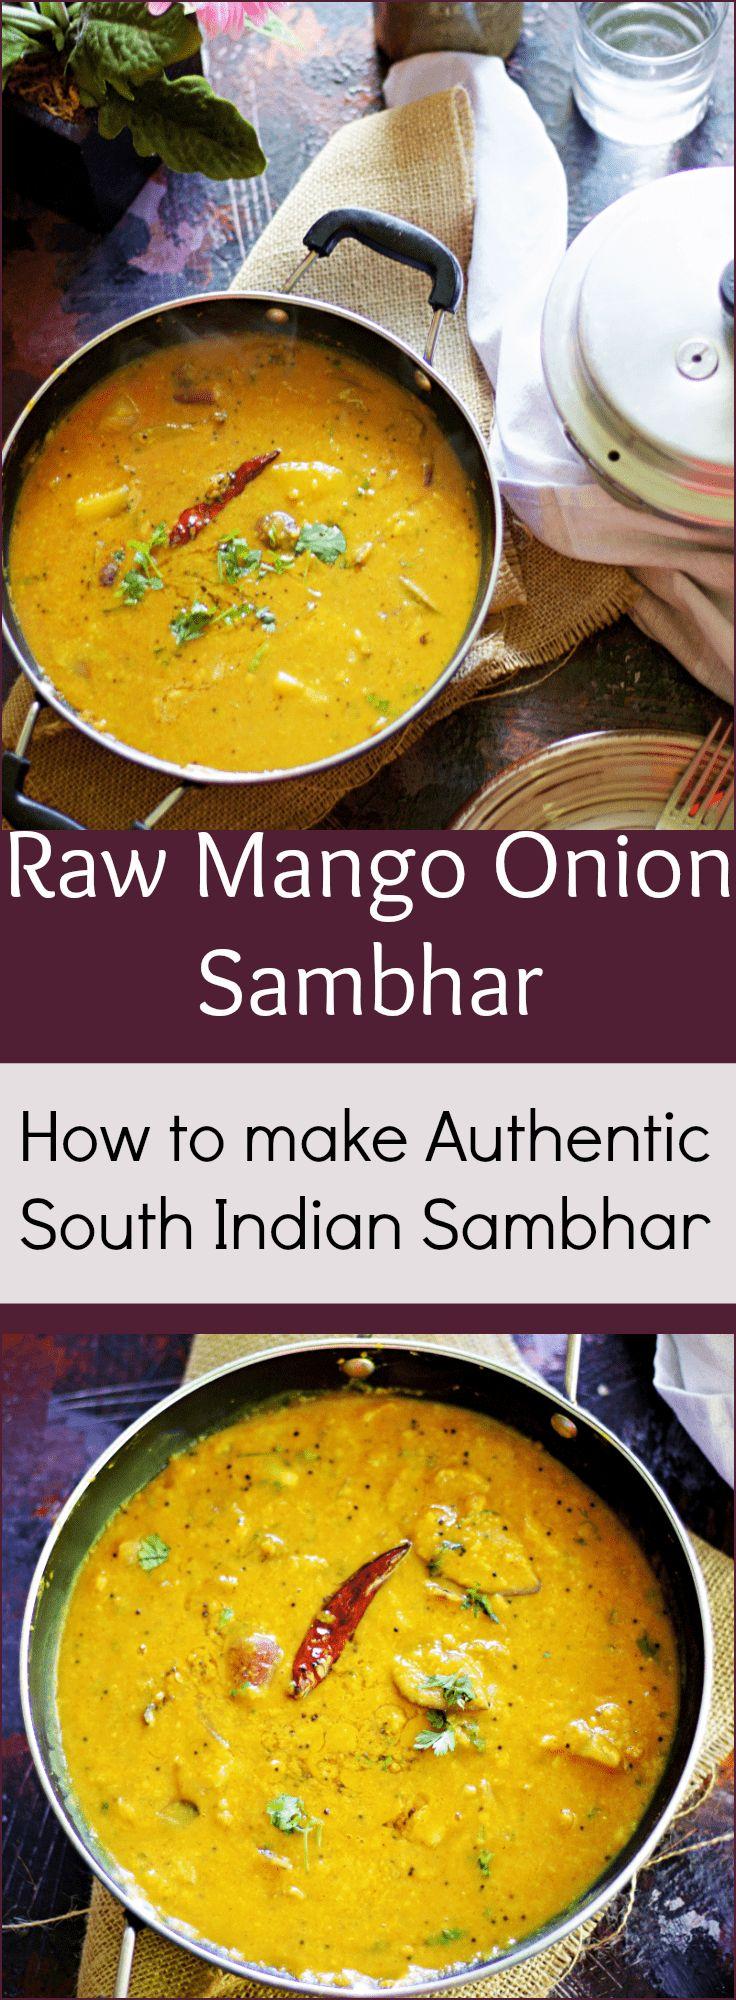 Raw Mango and Onion Sambar authentic sambar recipe Tambram sambar no tamarind photography